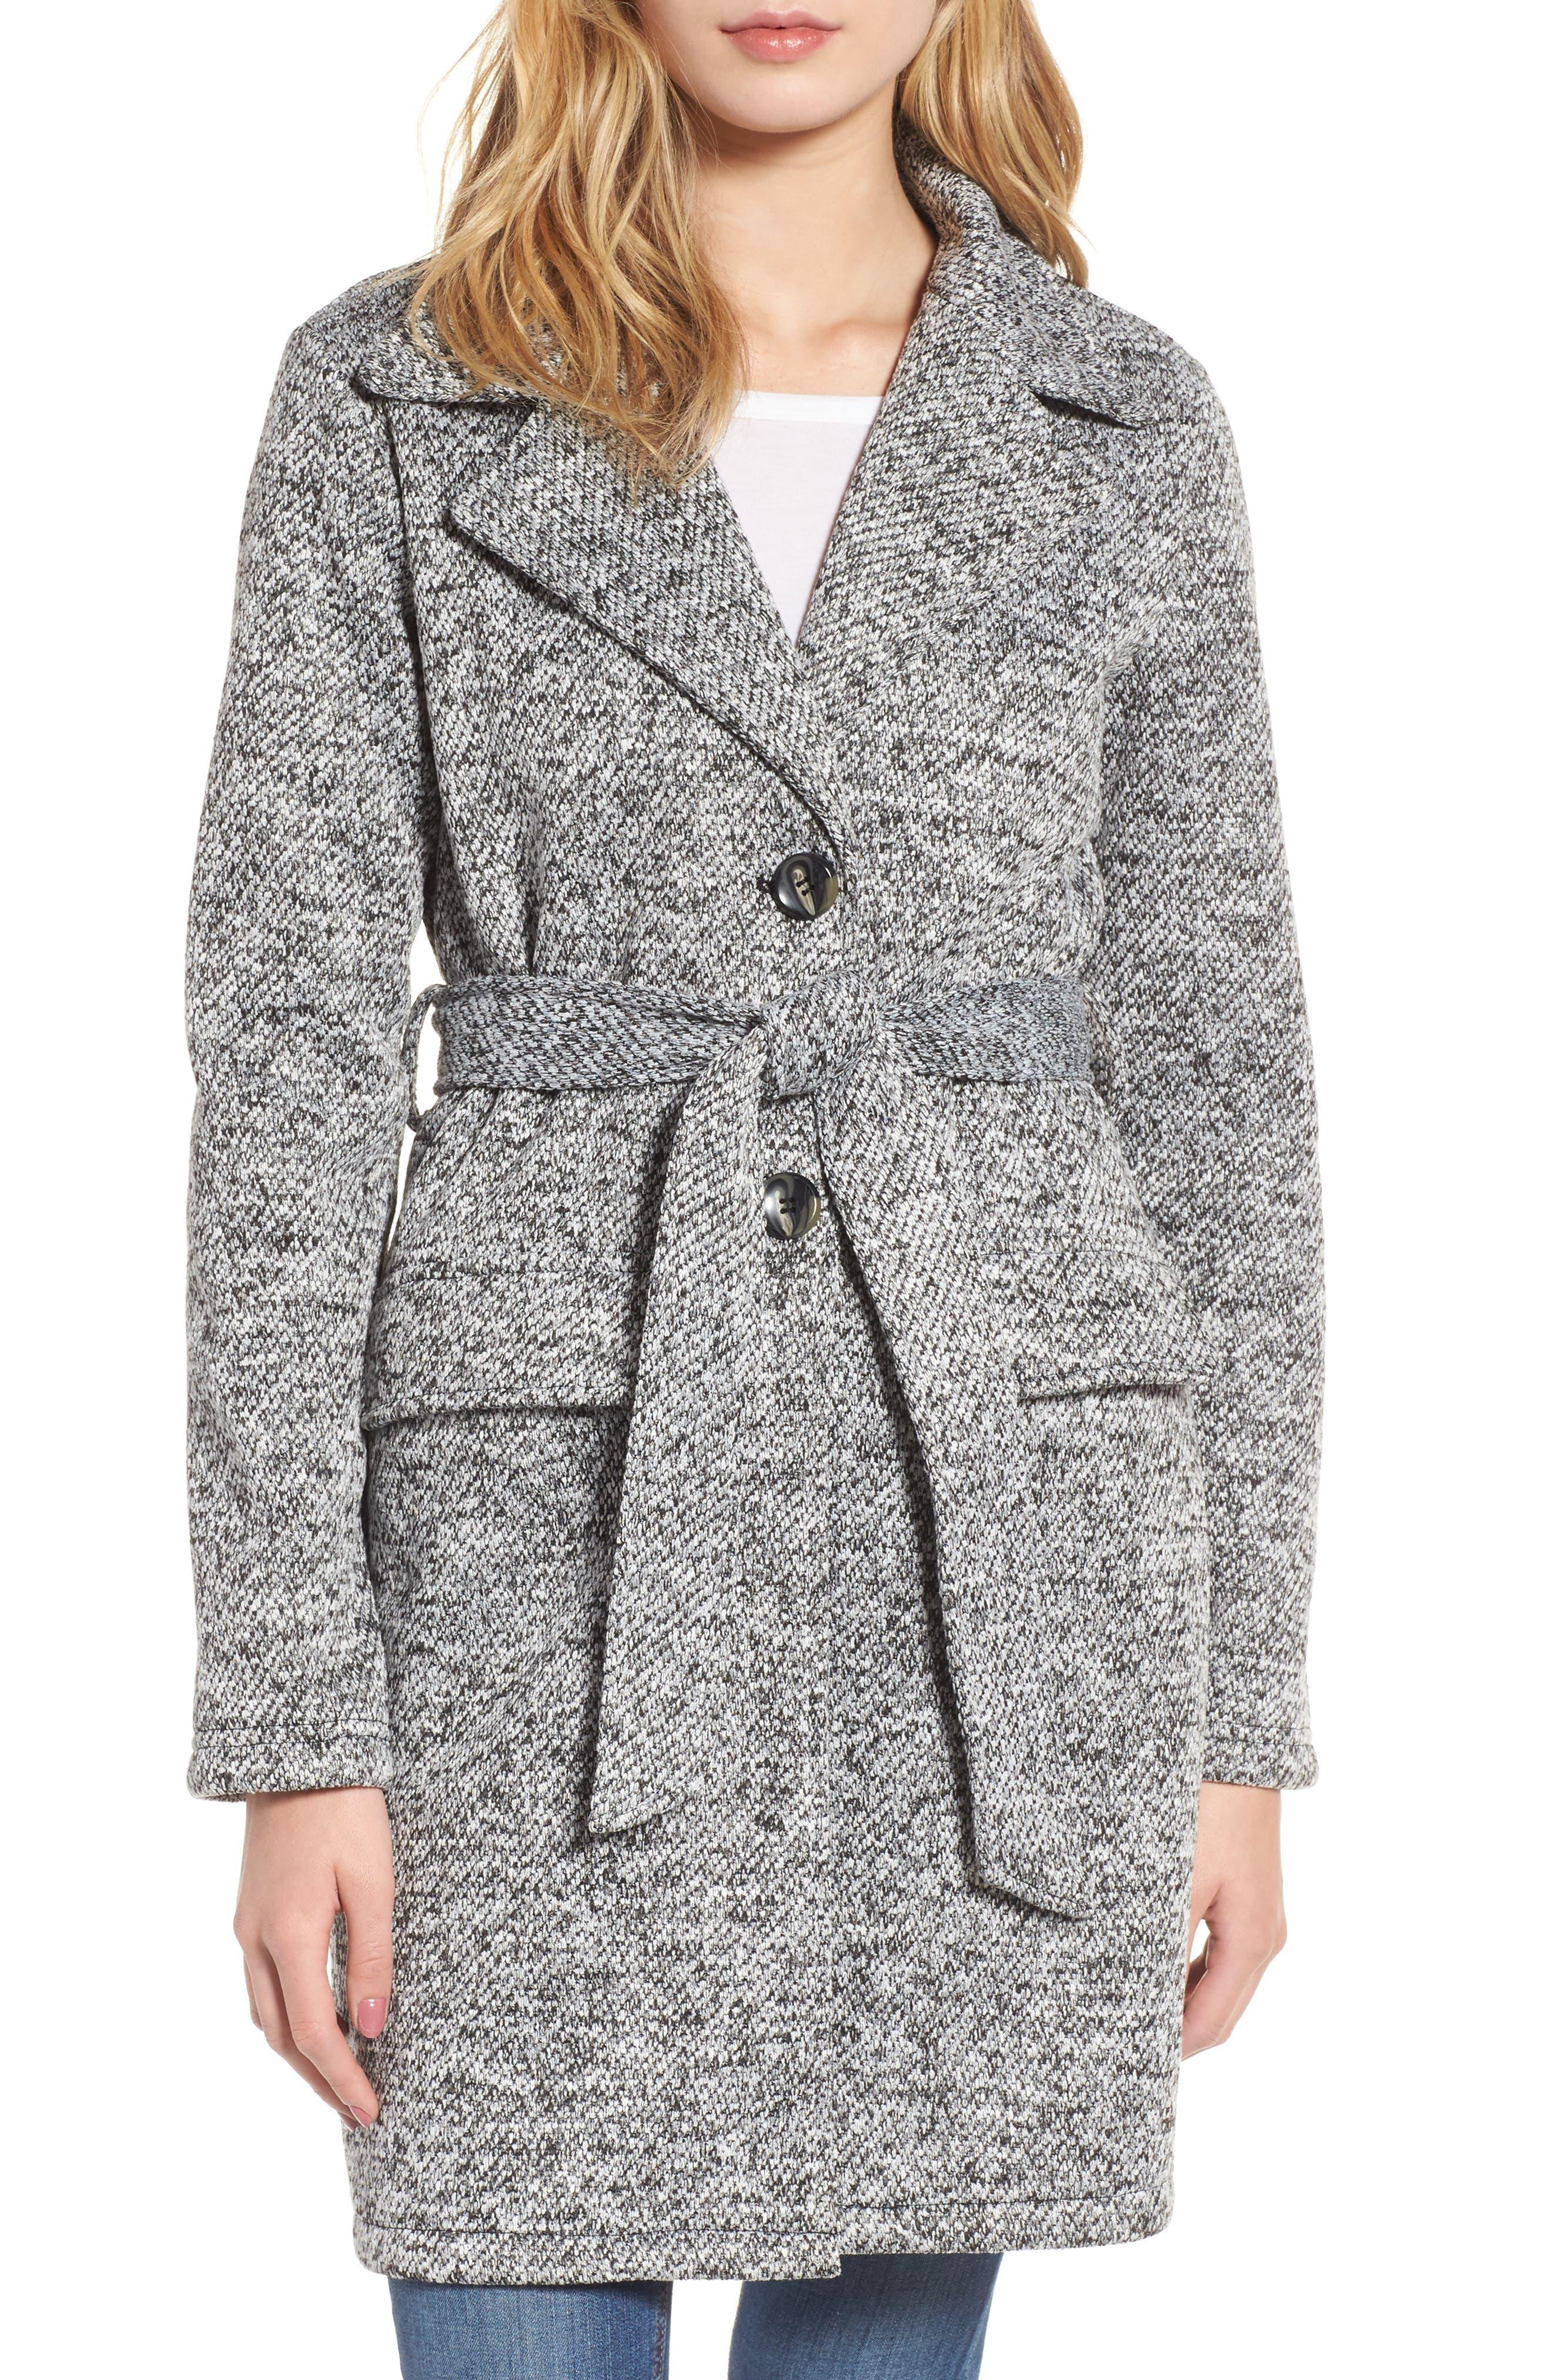 Belted Fleece Jacket,                             Alternate thumbnail 4, color,                             Light Grey Heather